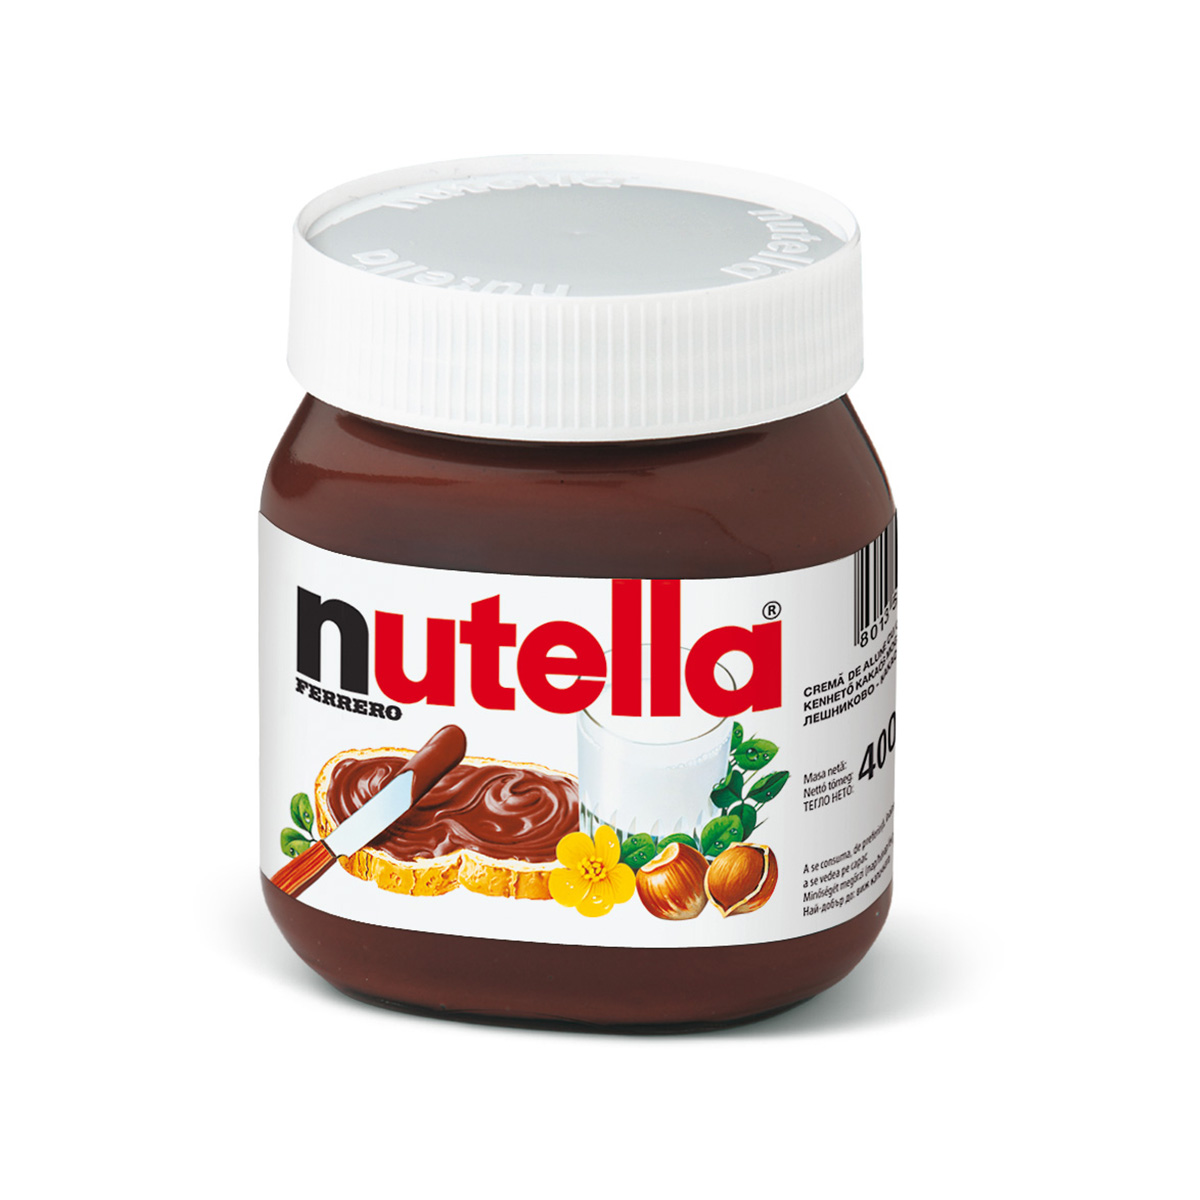 Crema de cacao cu alune Nutella, T400, 400 g imagine